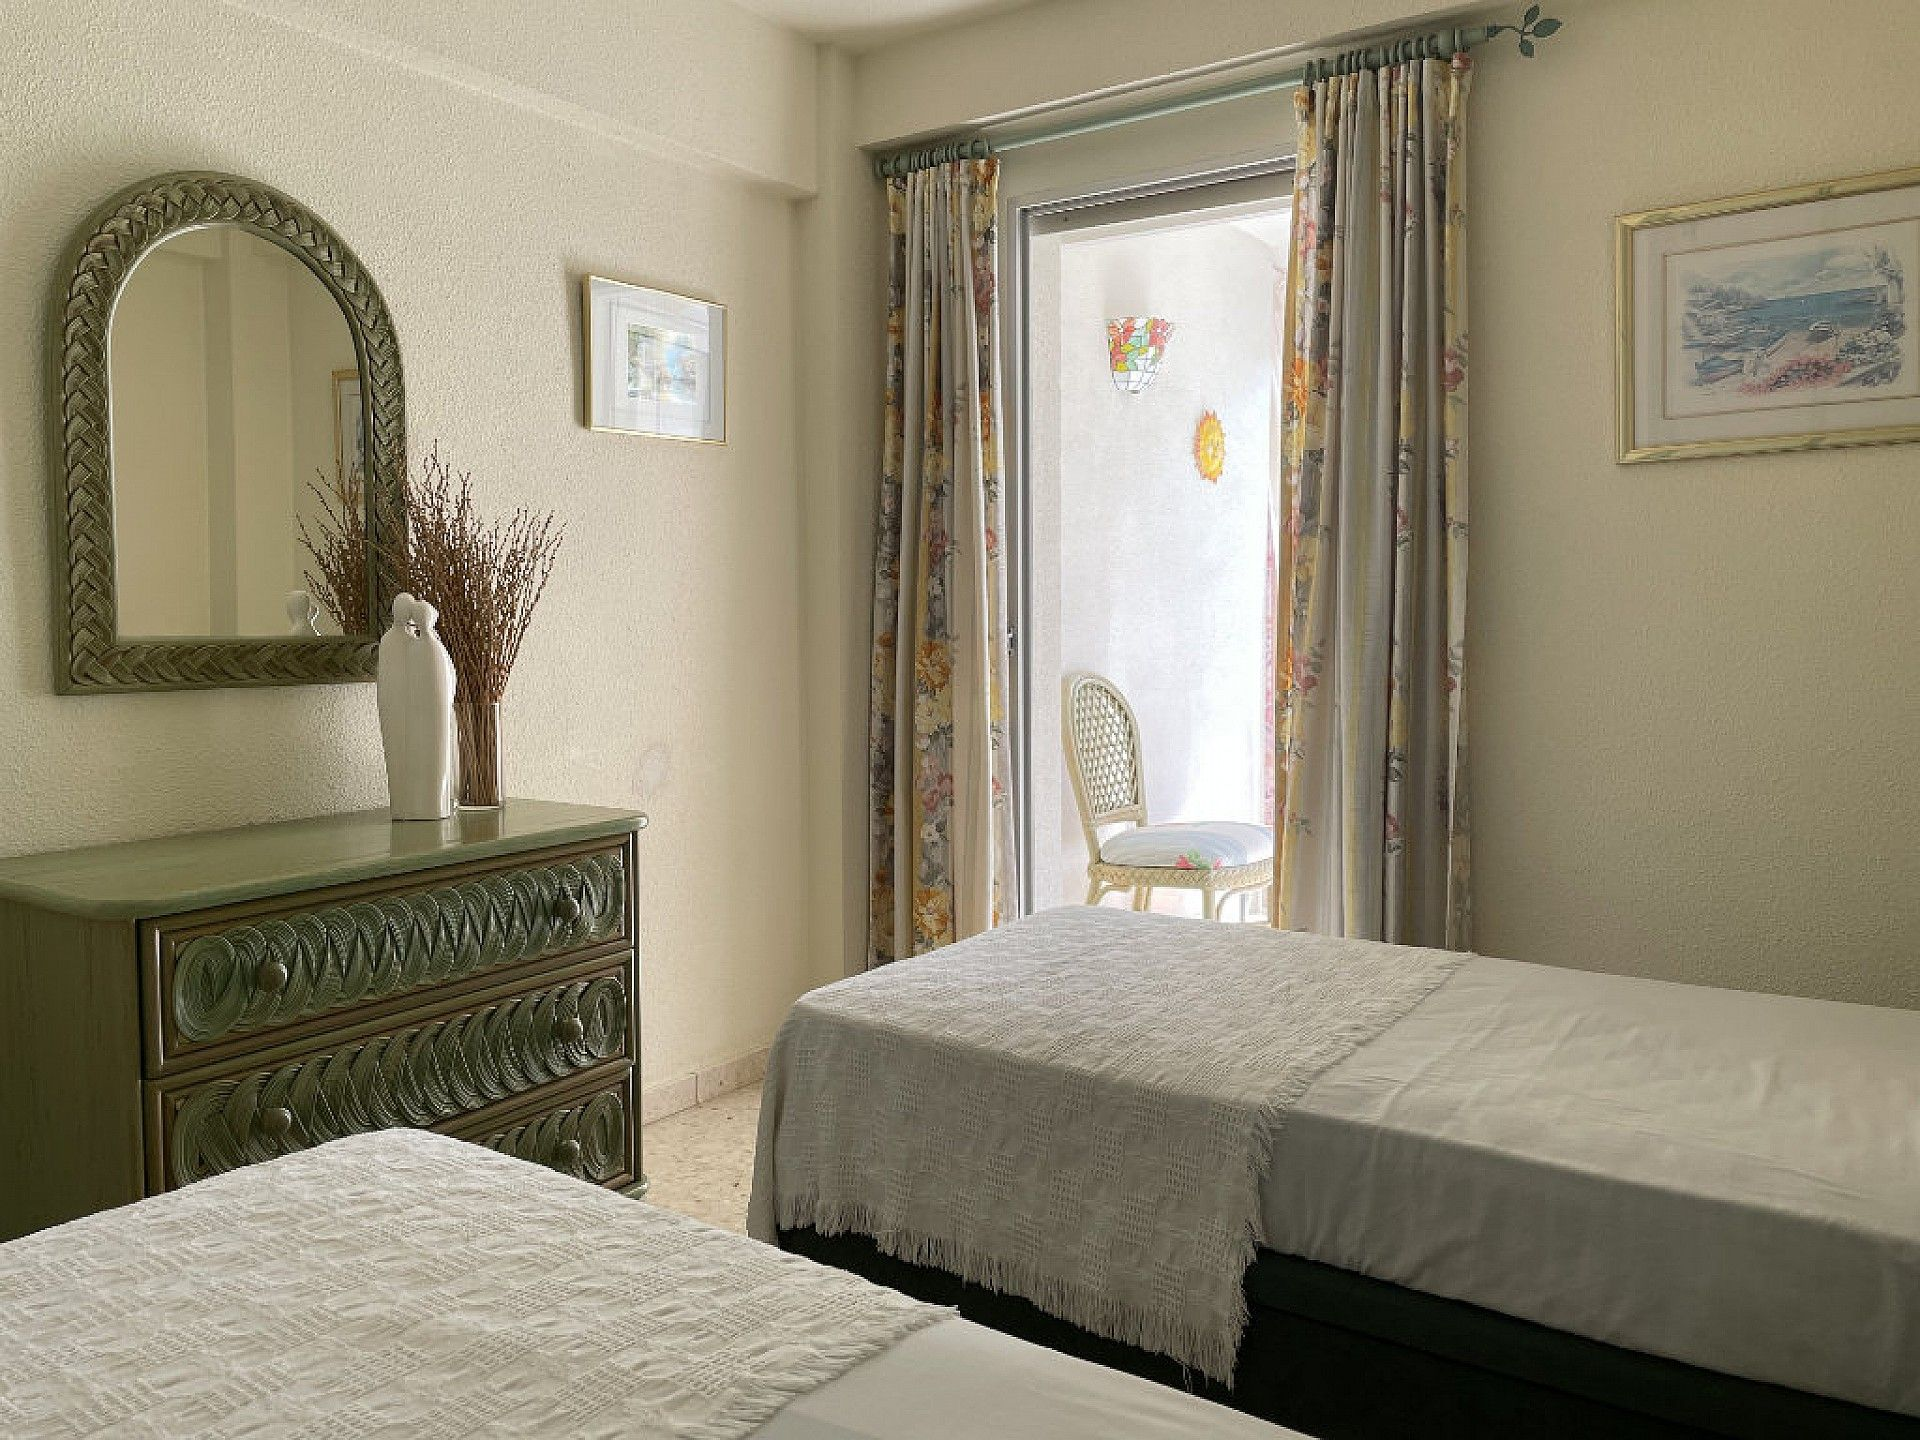 w_appartement-tekoop-costa-blanca-calpe-a1068-spanje17.jpg